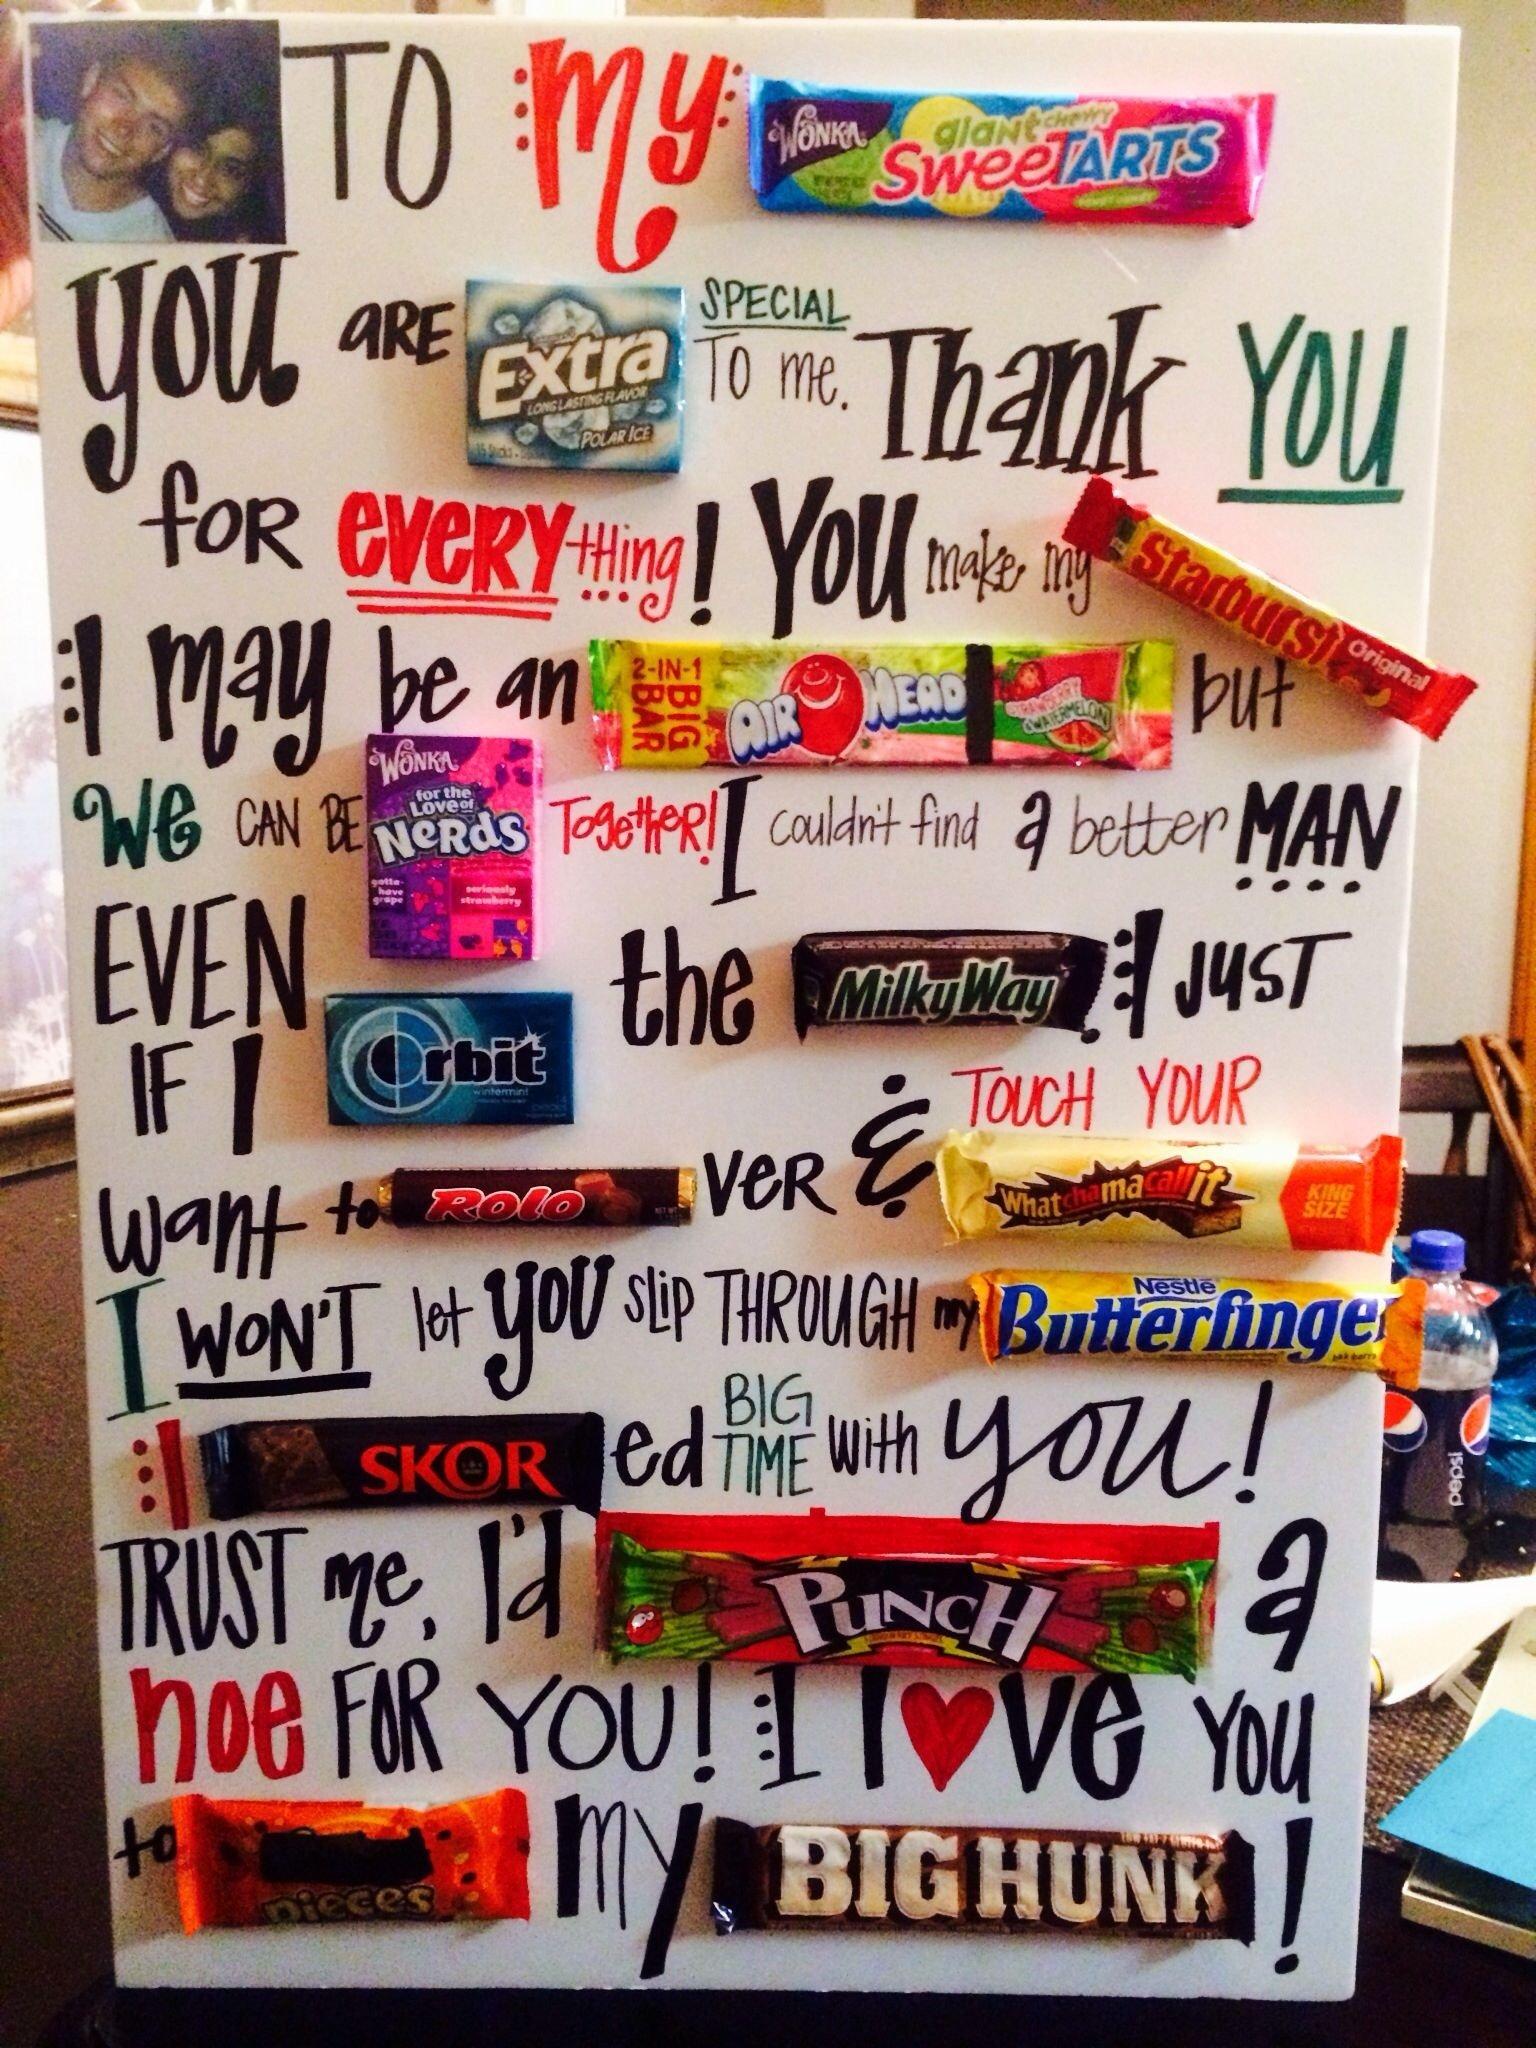 10 Cute Cute Anniversary Ideas For Boyfriend 20 cute valentines day ideas boyfriends gift and anniversaries 2020